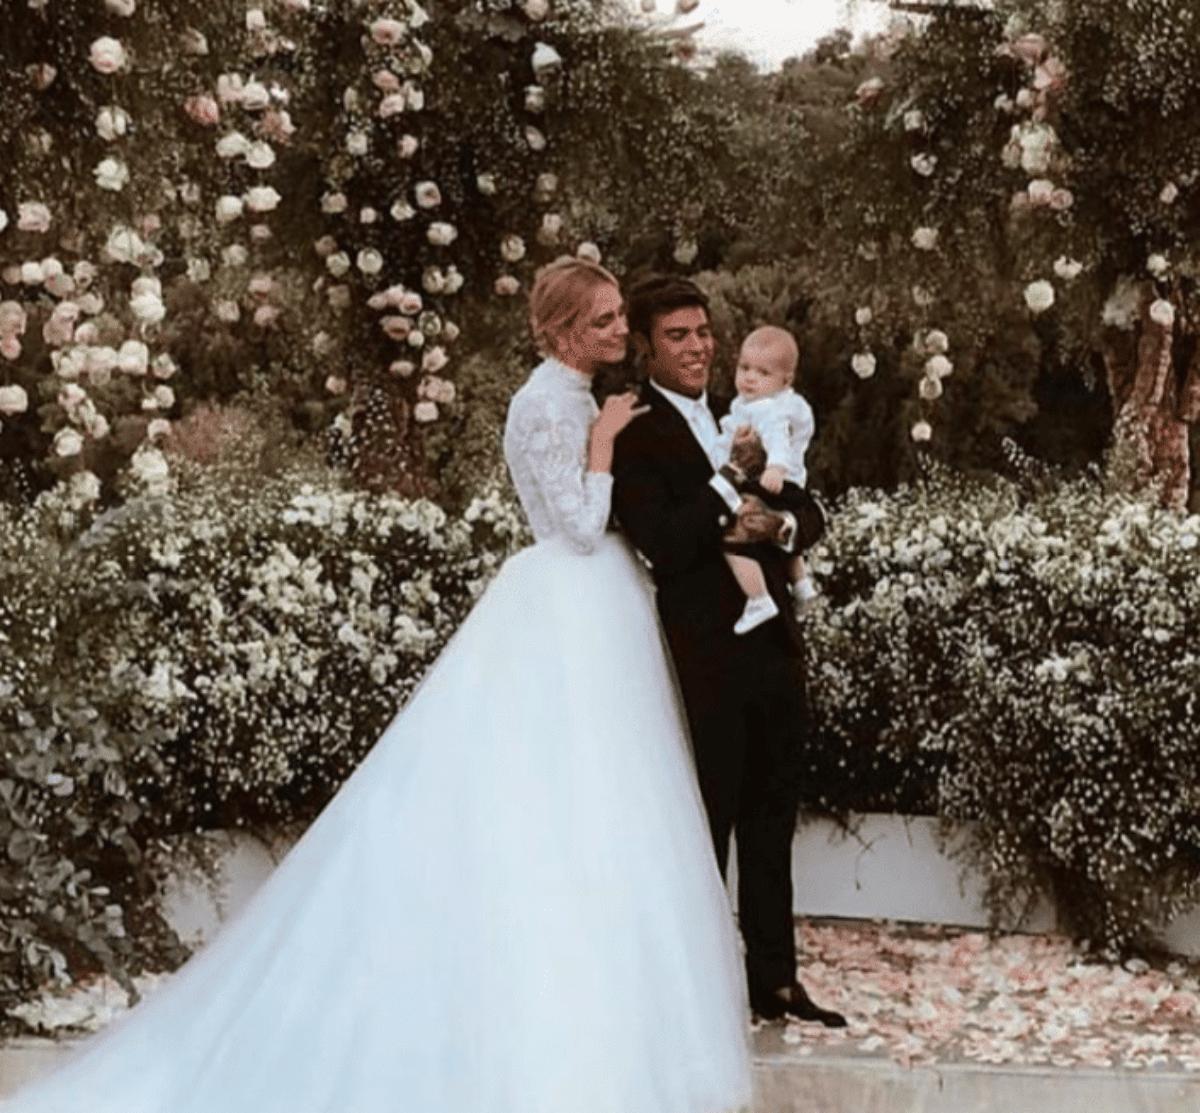 5fdab4063862 Matrimonio Chiara Ferragni Fedez